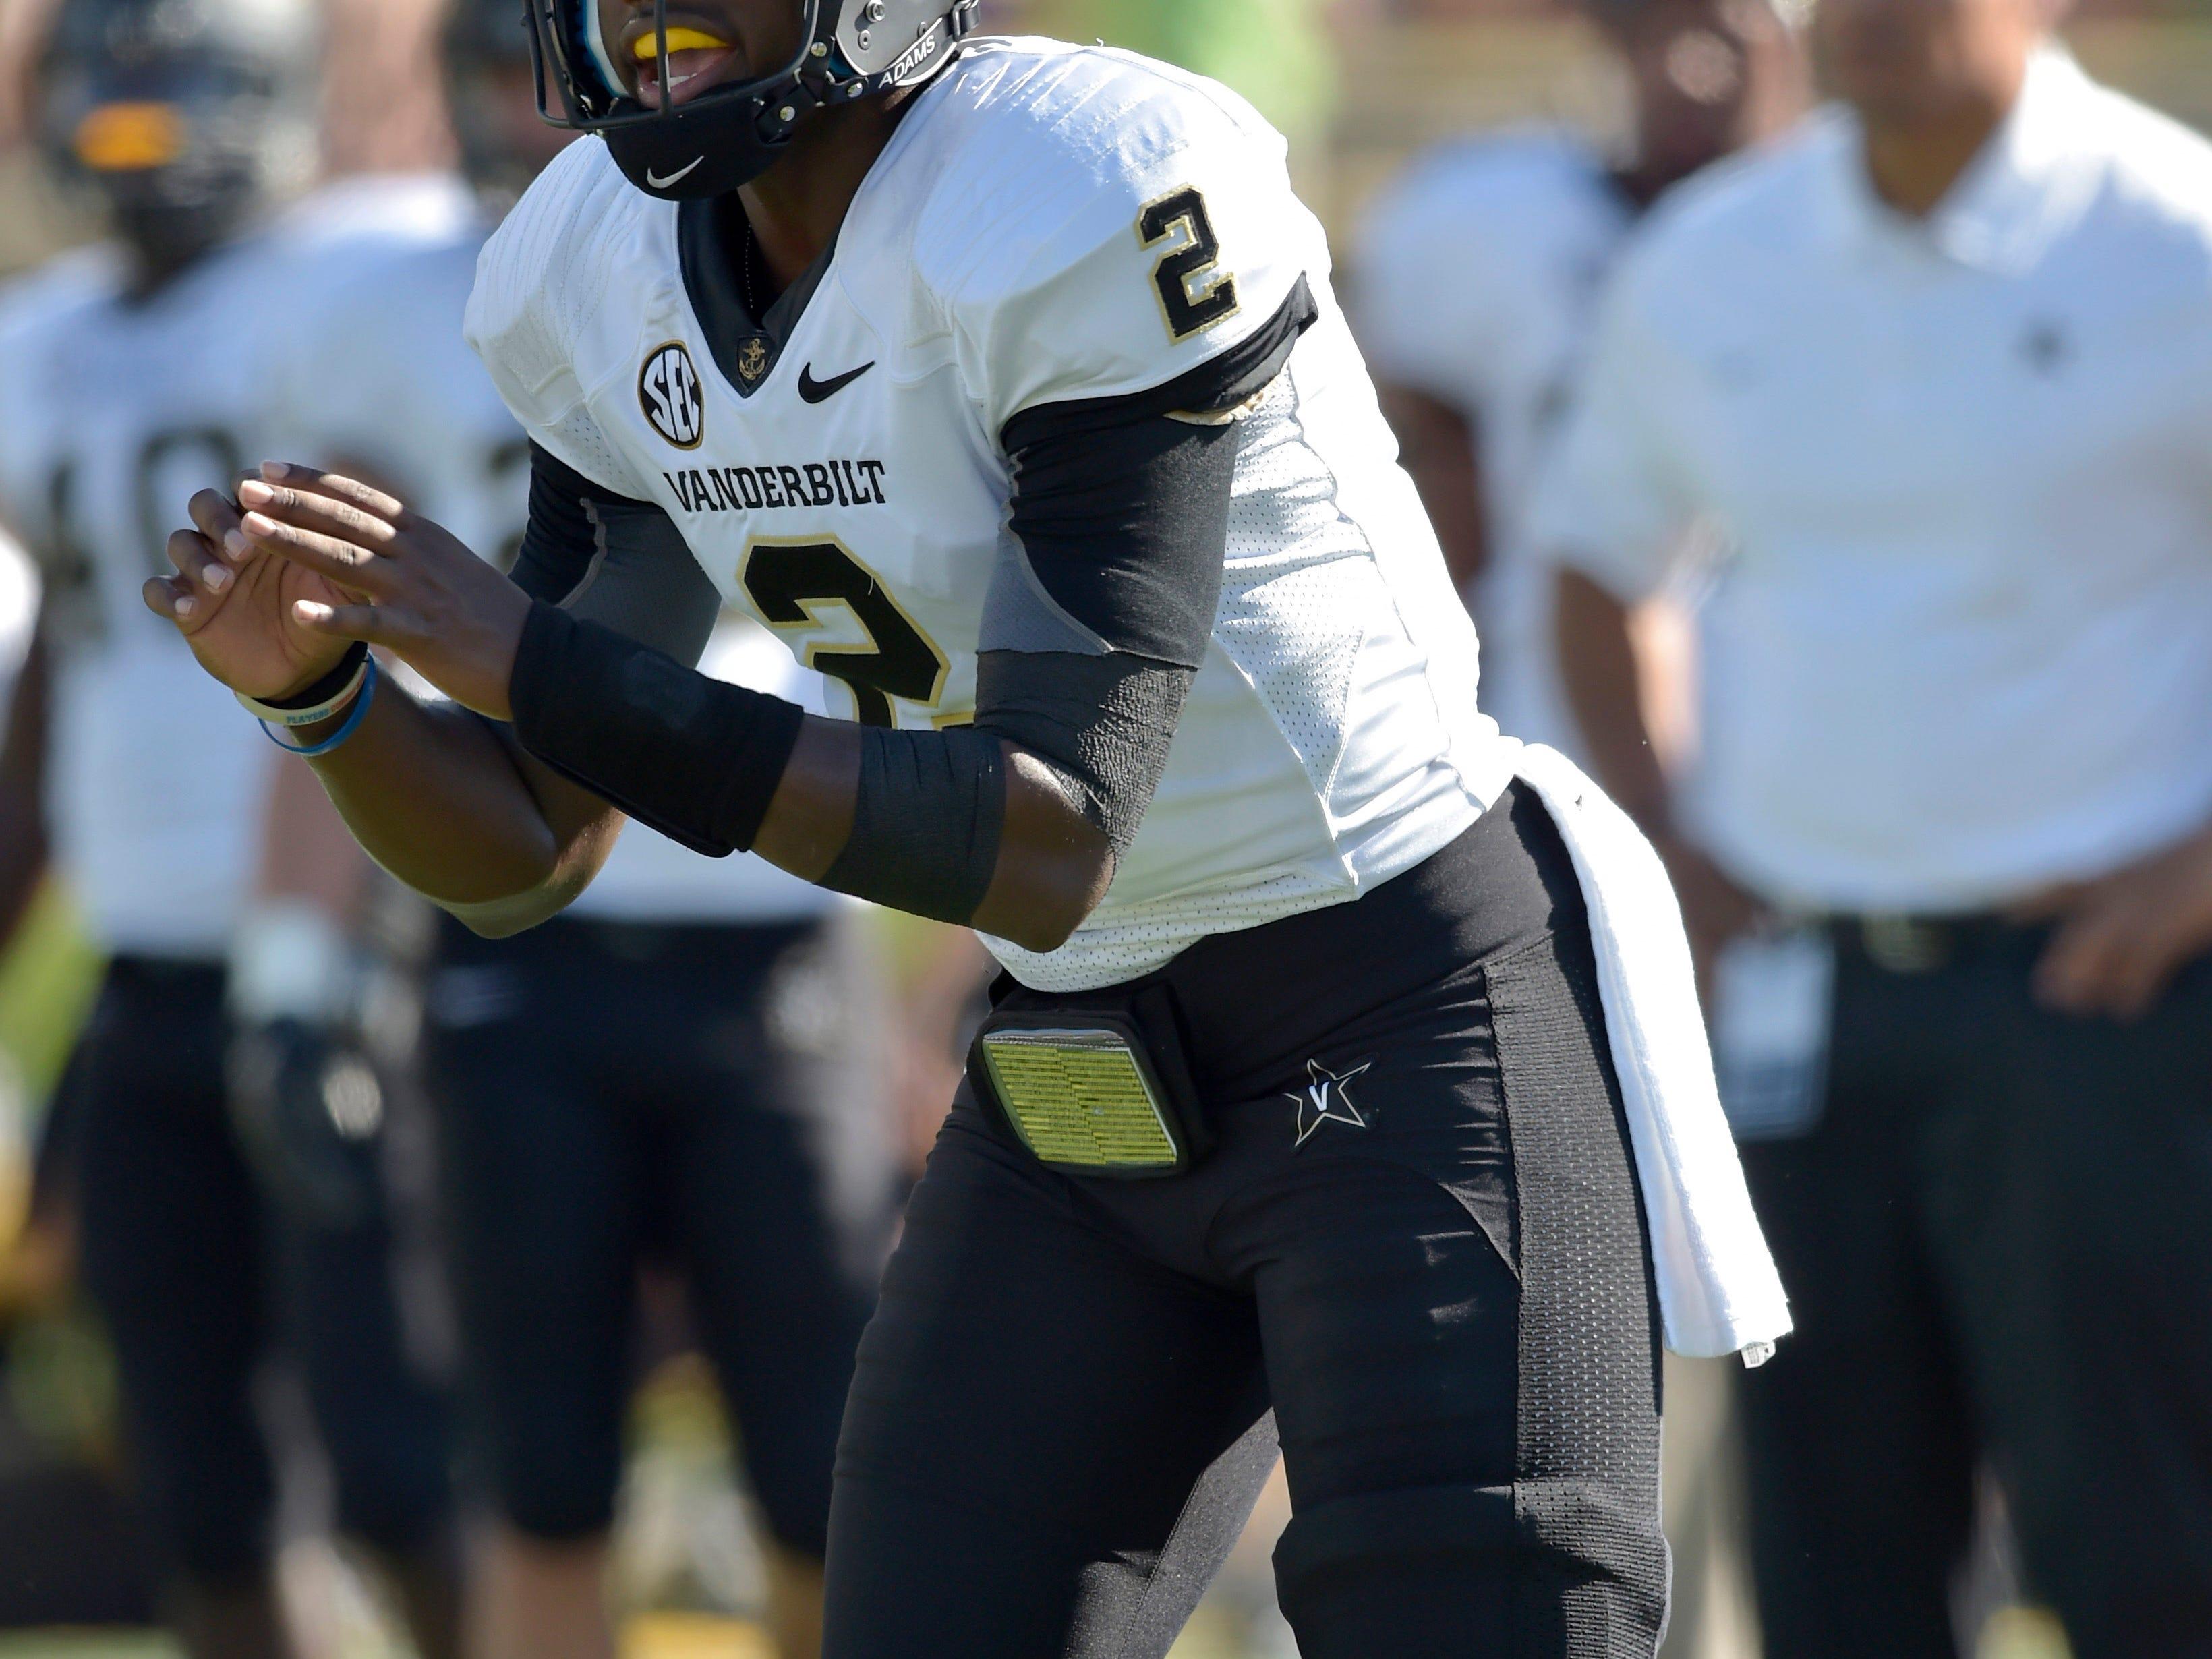 Vanderbilt quarterback Johnny McCrary made his first start at Missouri last week.